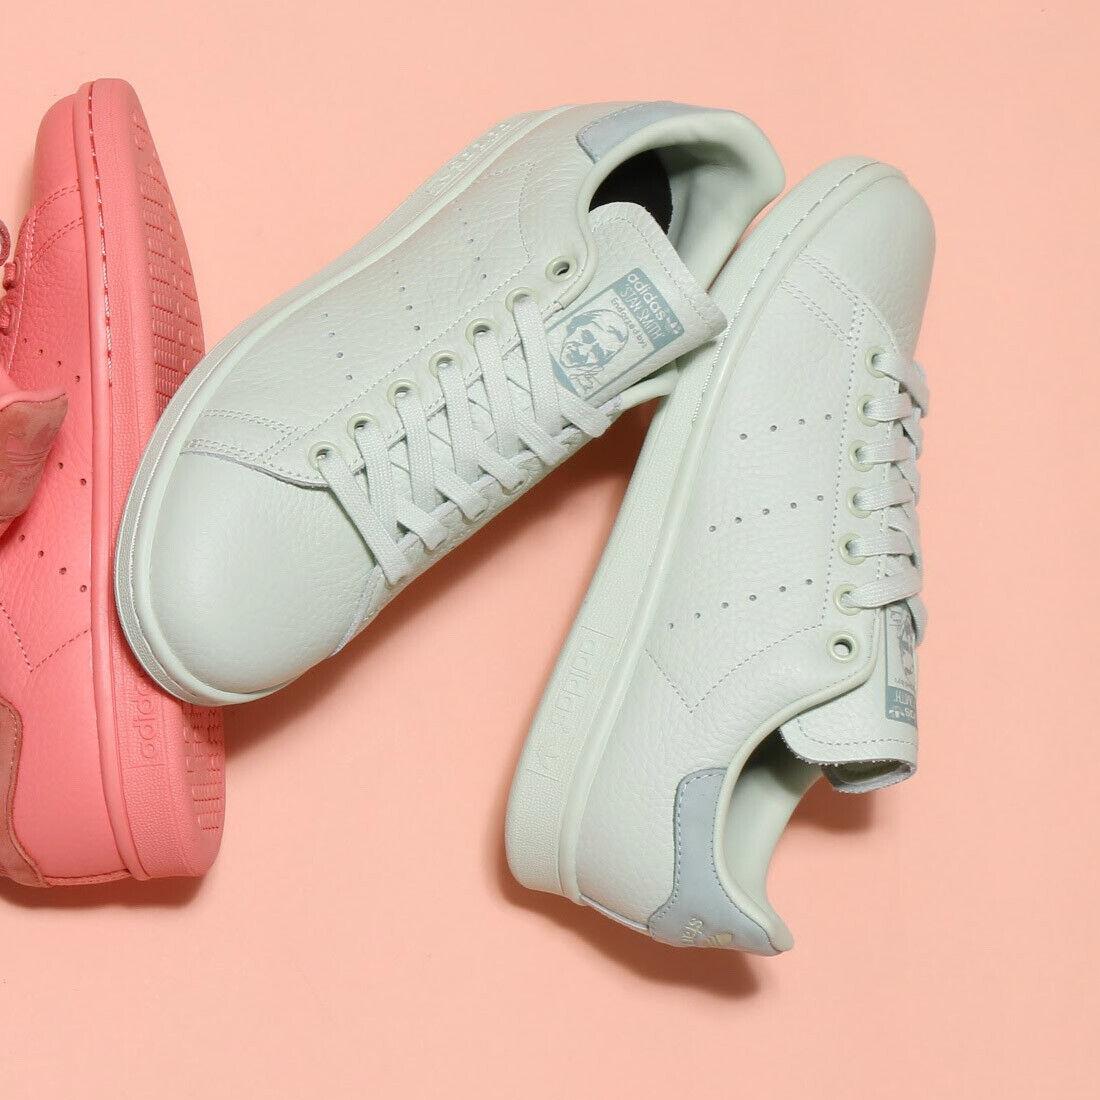 Adidas Stan Smith Leather ® ( Men Sizes UK  7 8 9.5 ) Tumbled leather upper